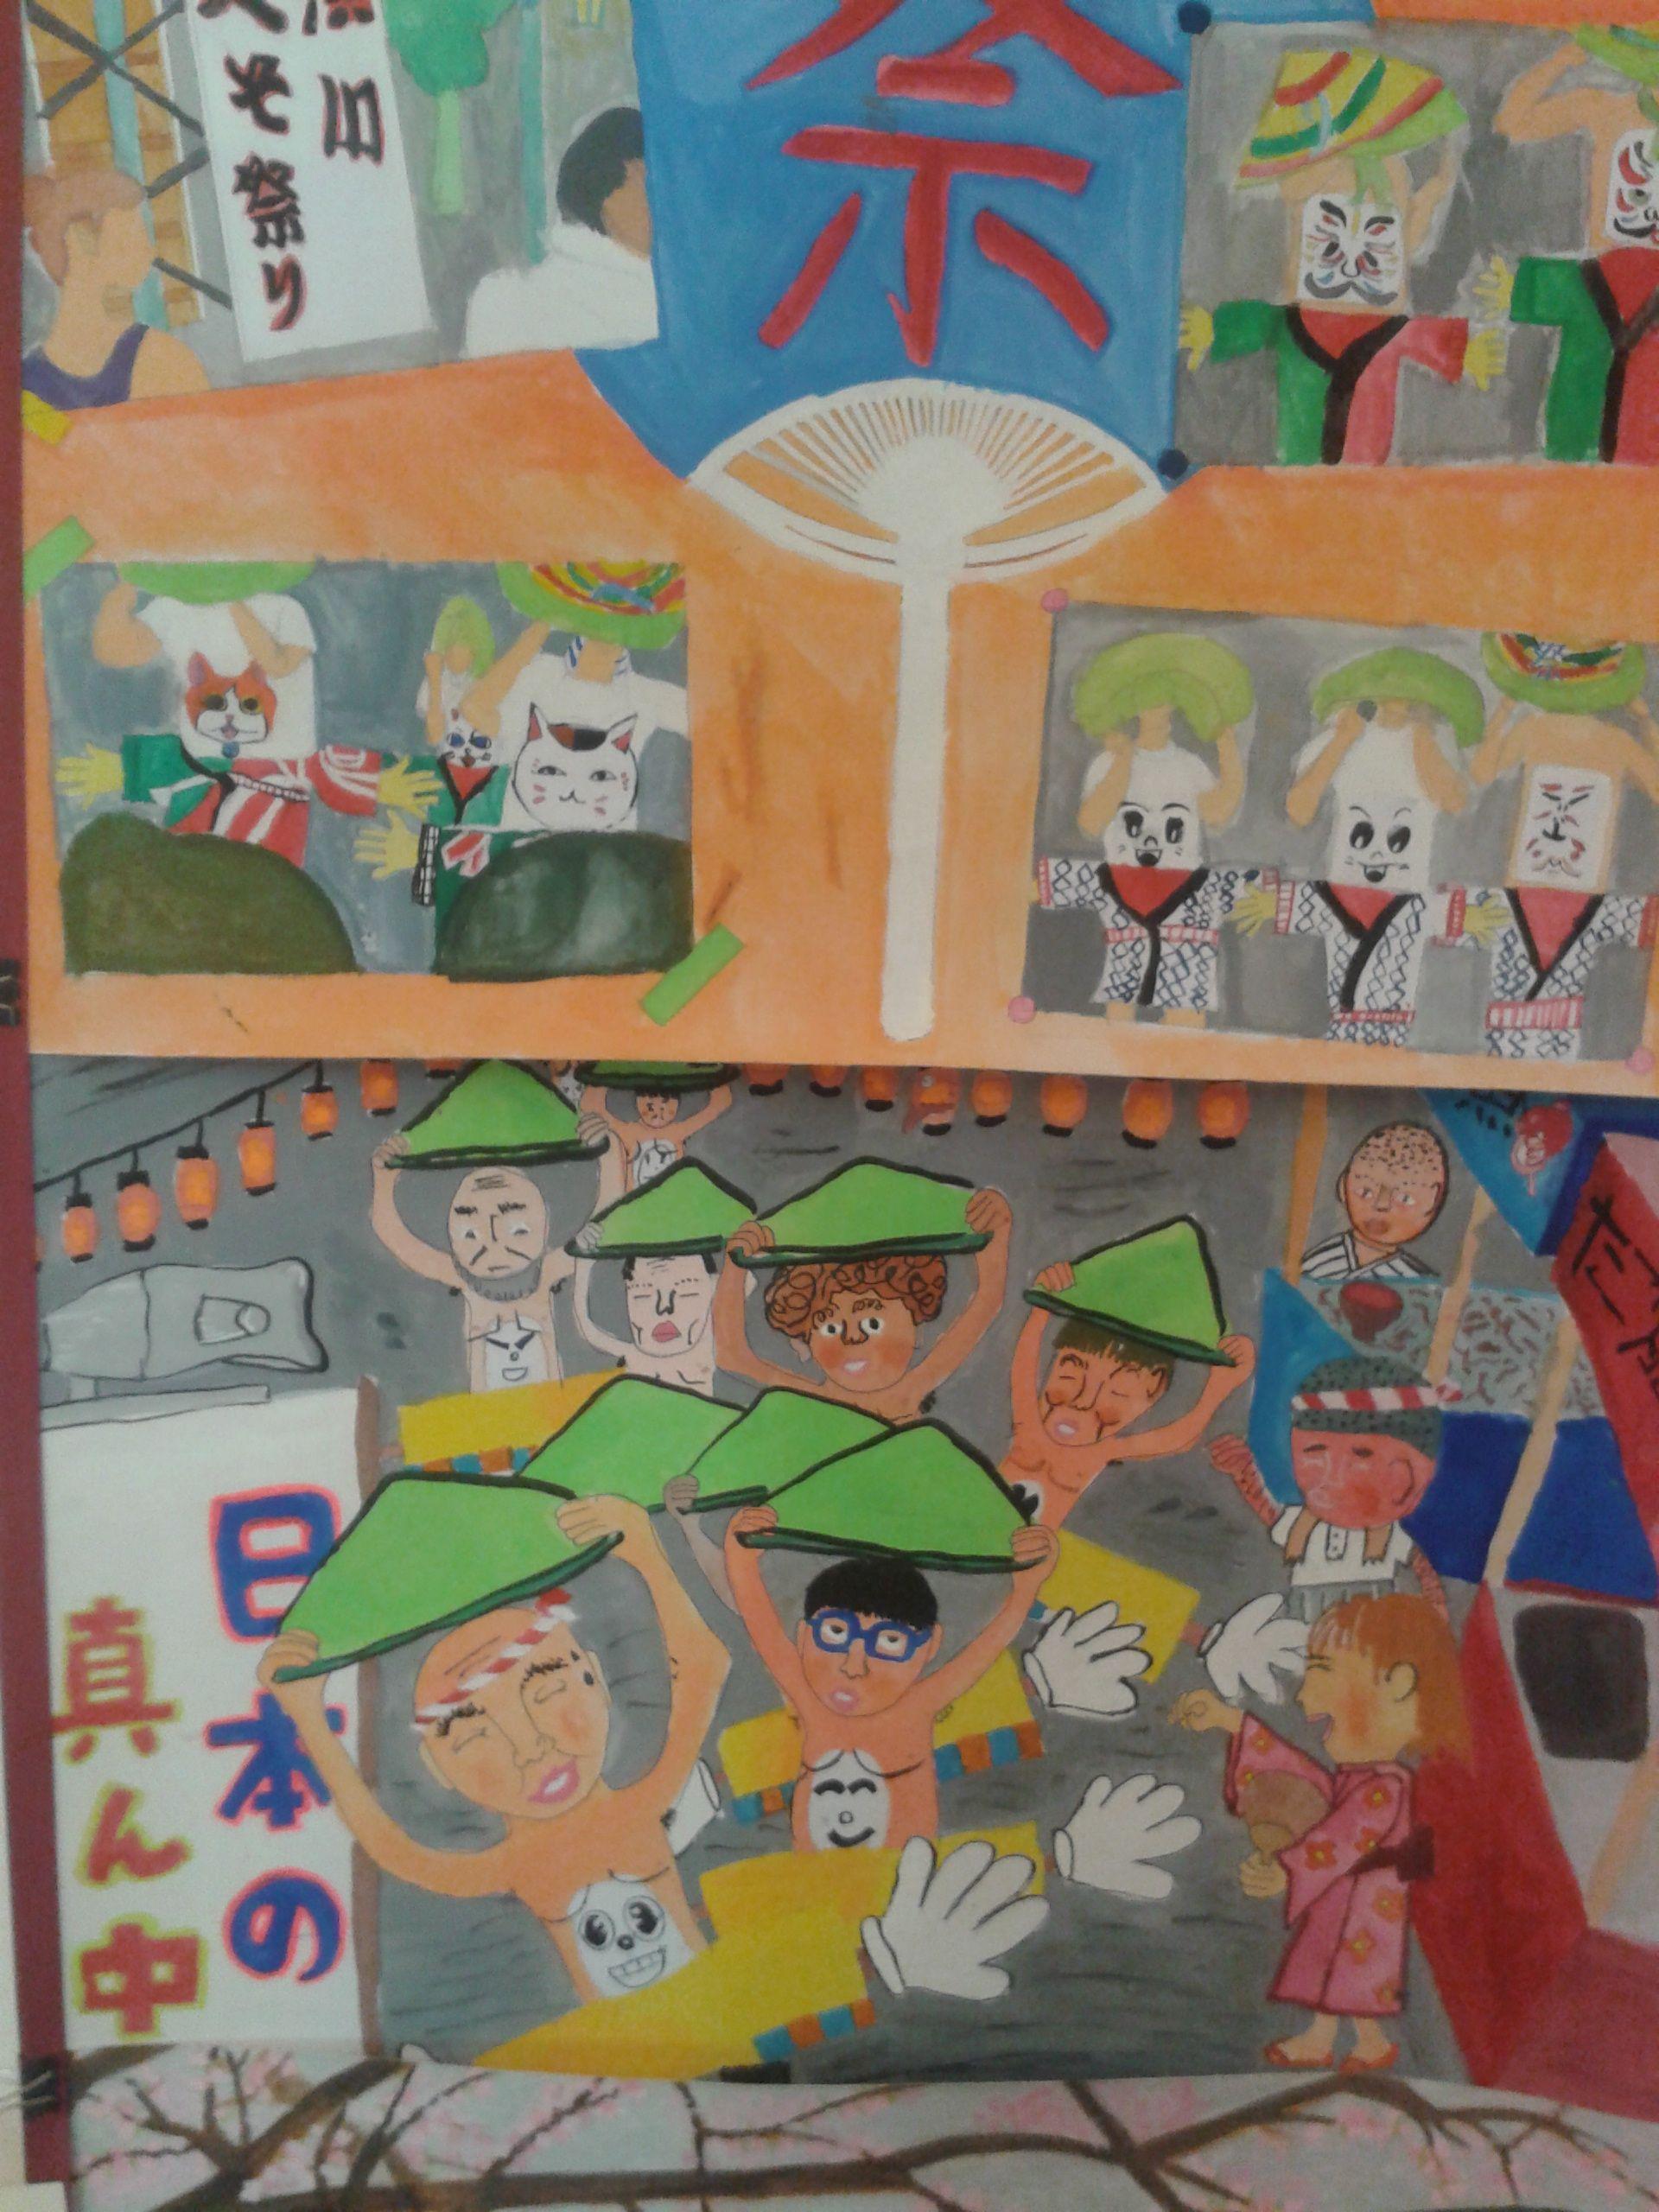 shibukawa disegni foligno